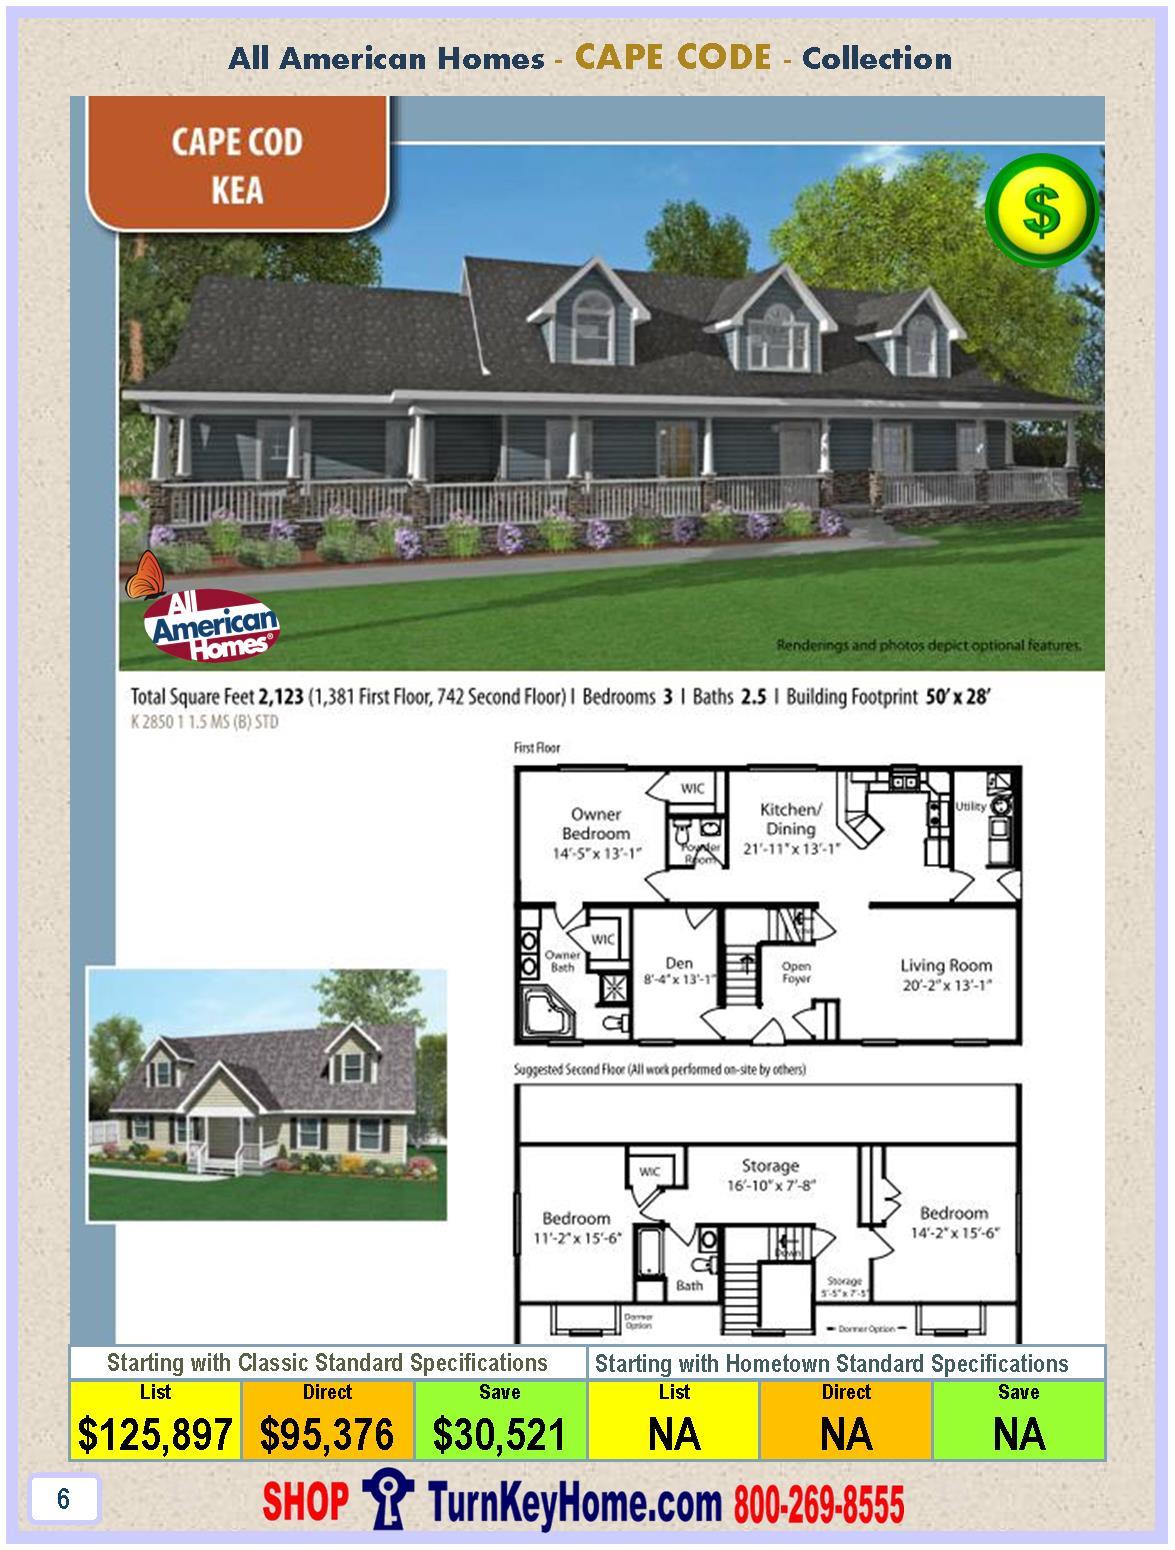 Modular.Home.All.American.Homes.Cape.Cod.KEA.Plan.Price.P6.11.28